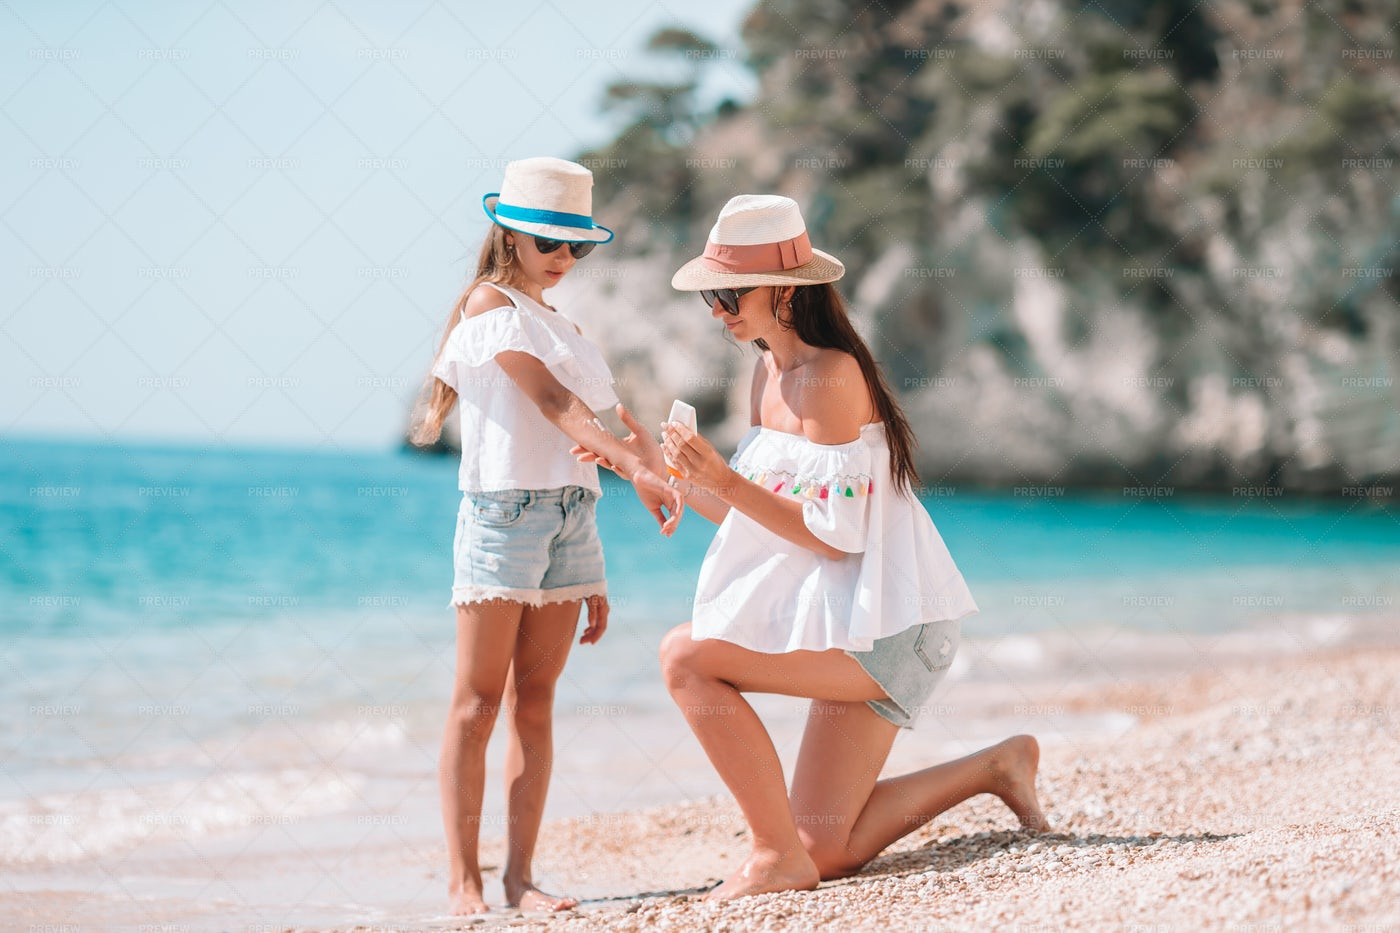 Using Sun Lotion: Stock Photos